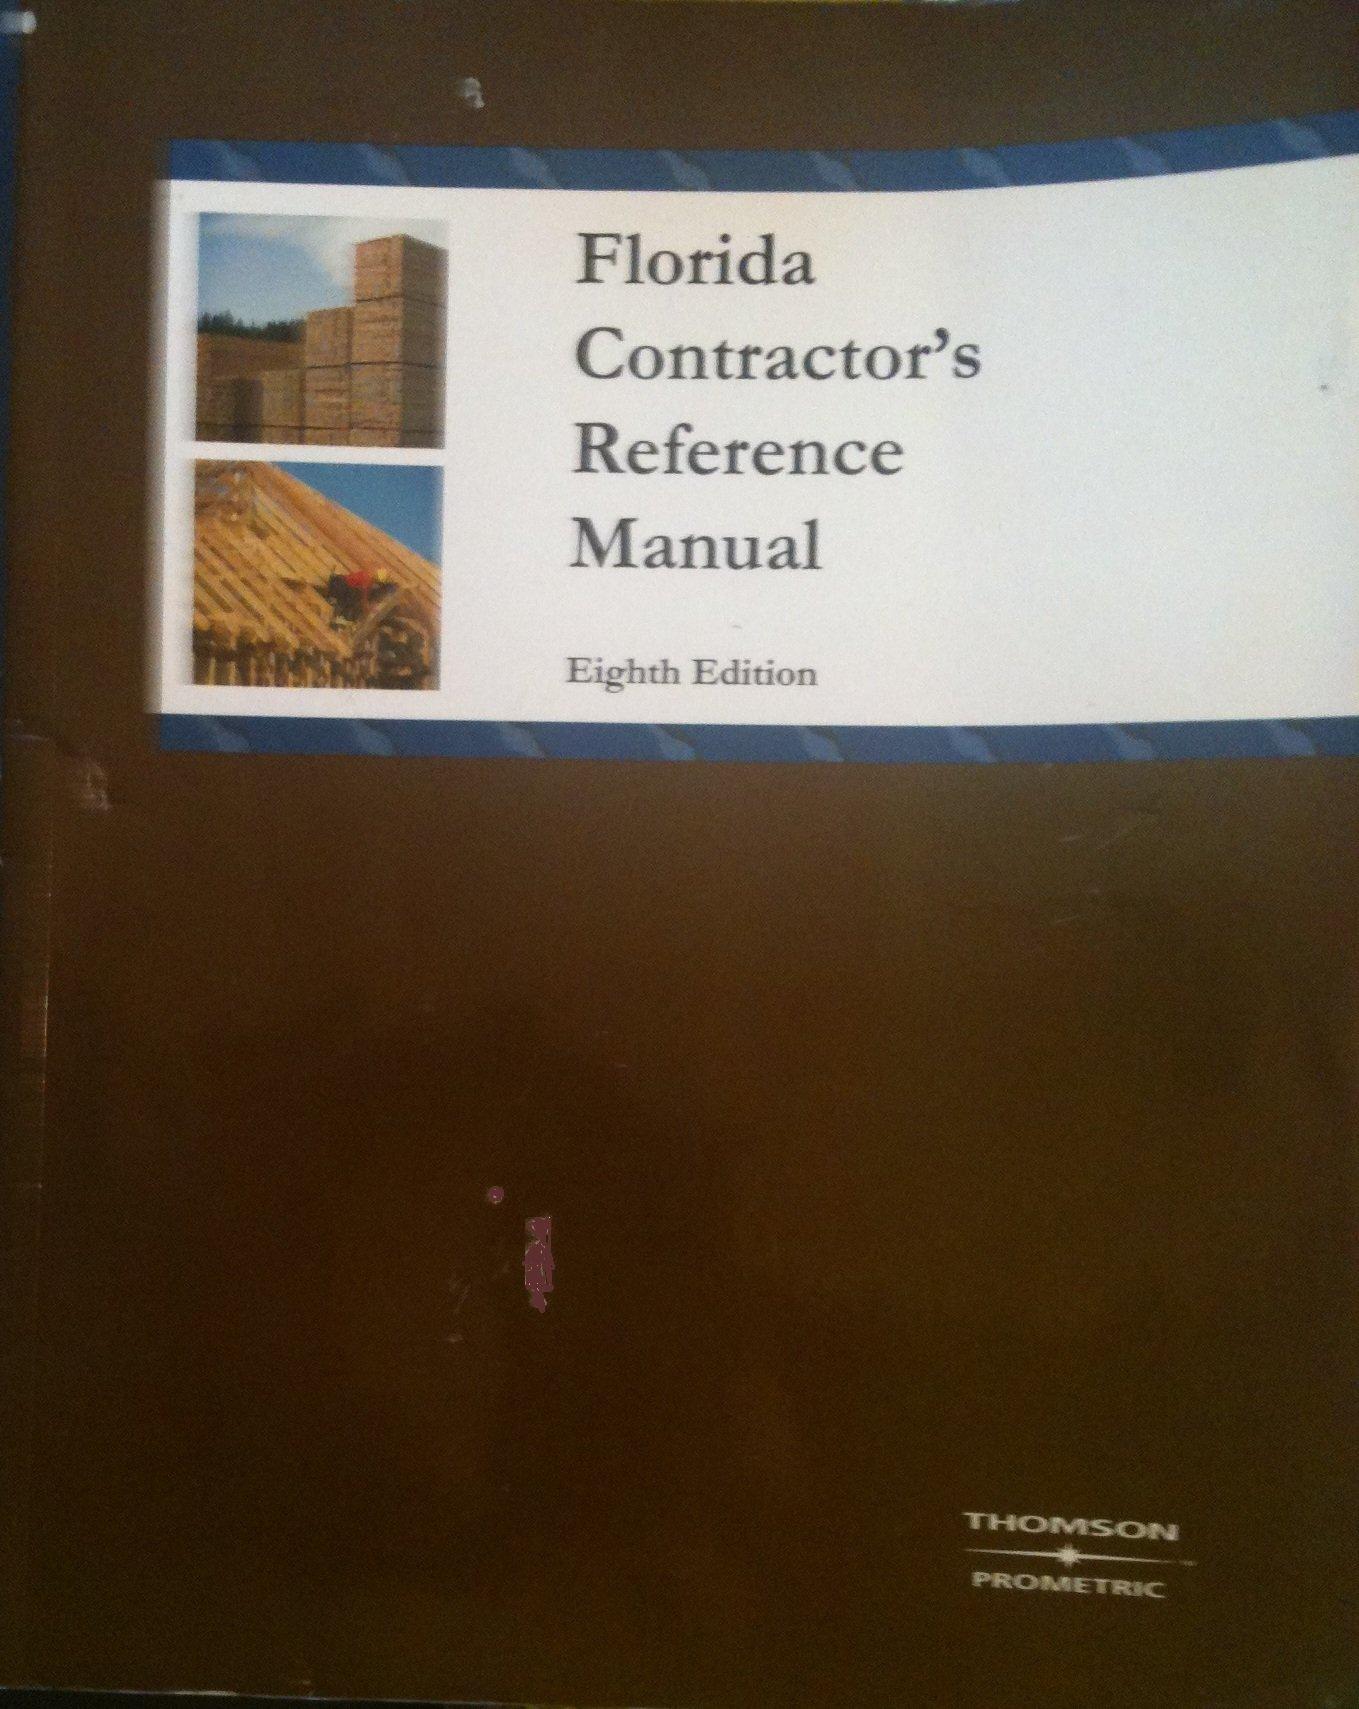 Florida Contractor's Reference Manual (2006 Edition): Prometric:  9781931345255: Amazon.com: Books